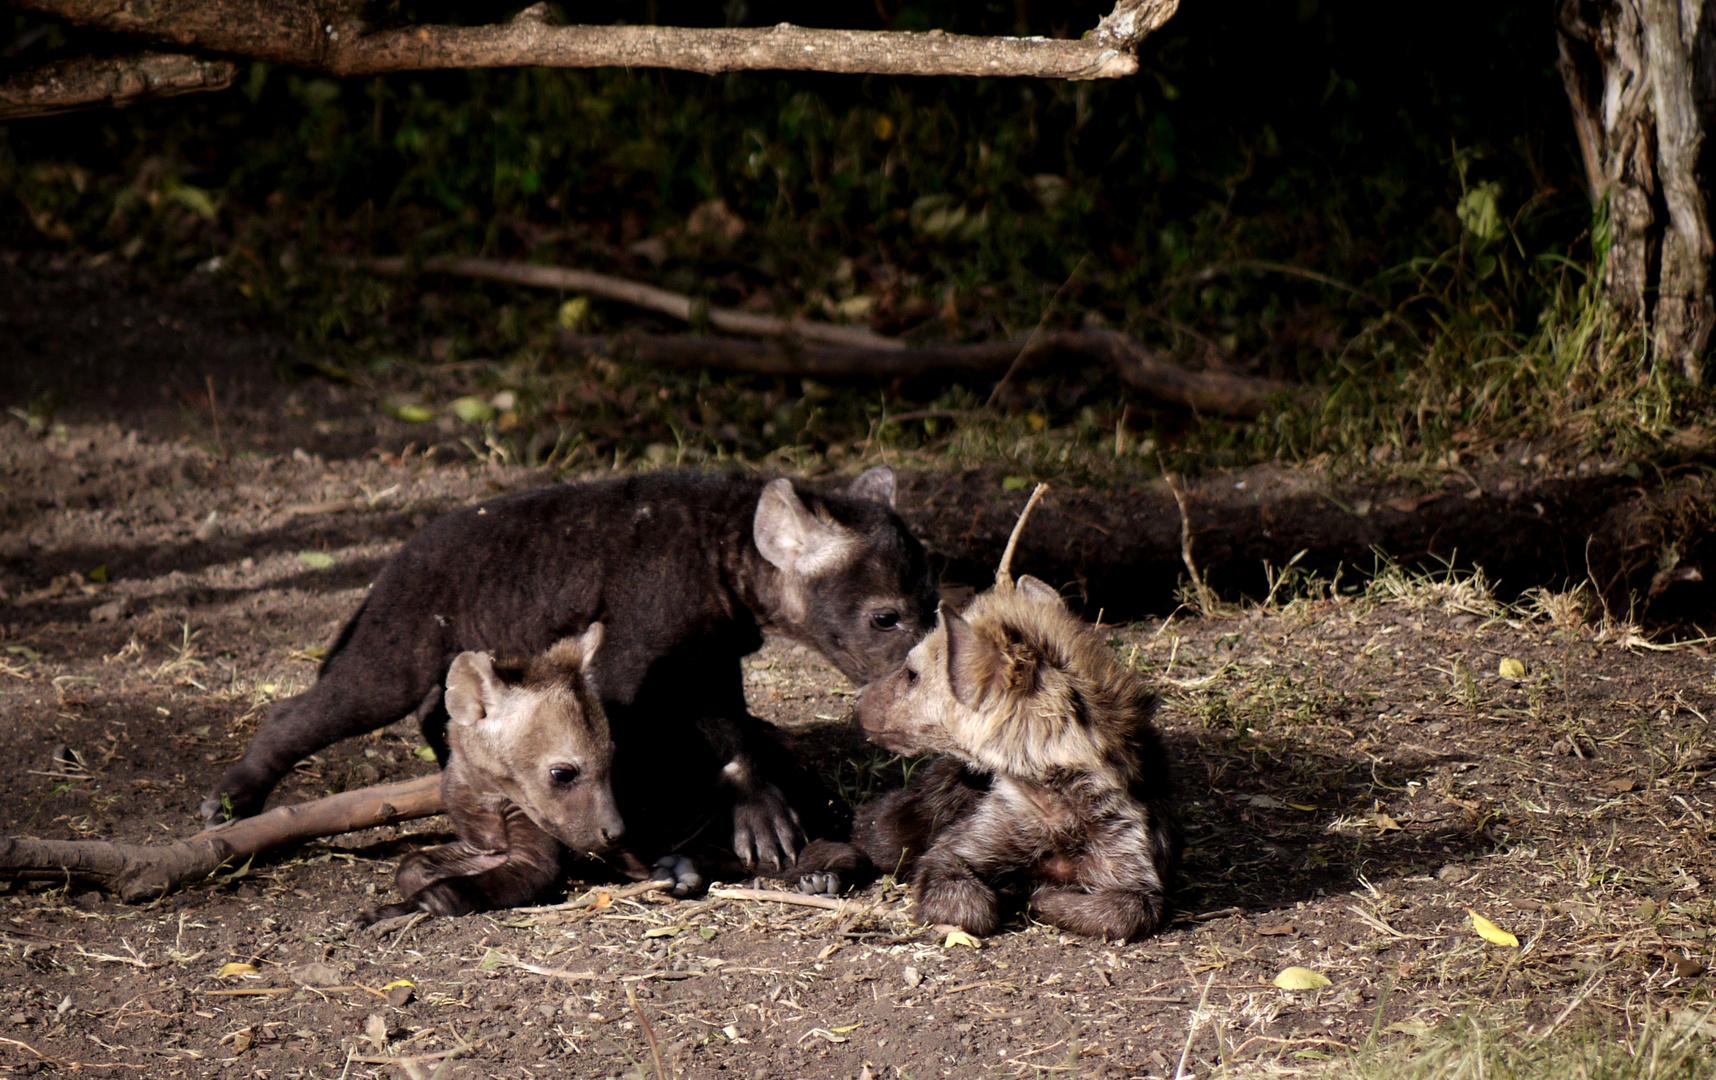 Hyänenkinder